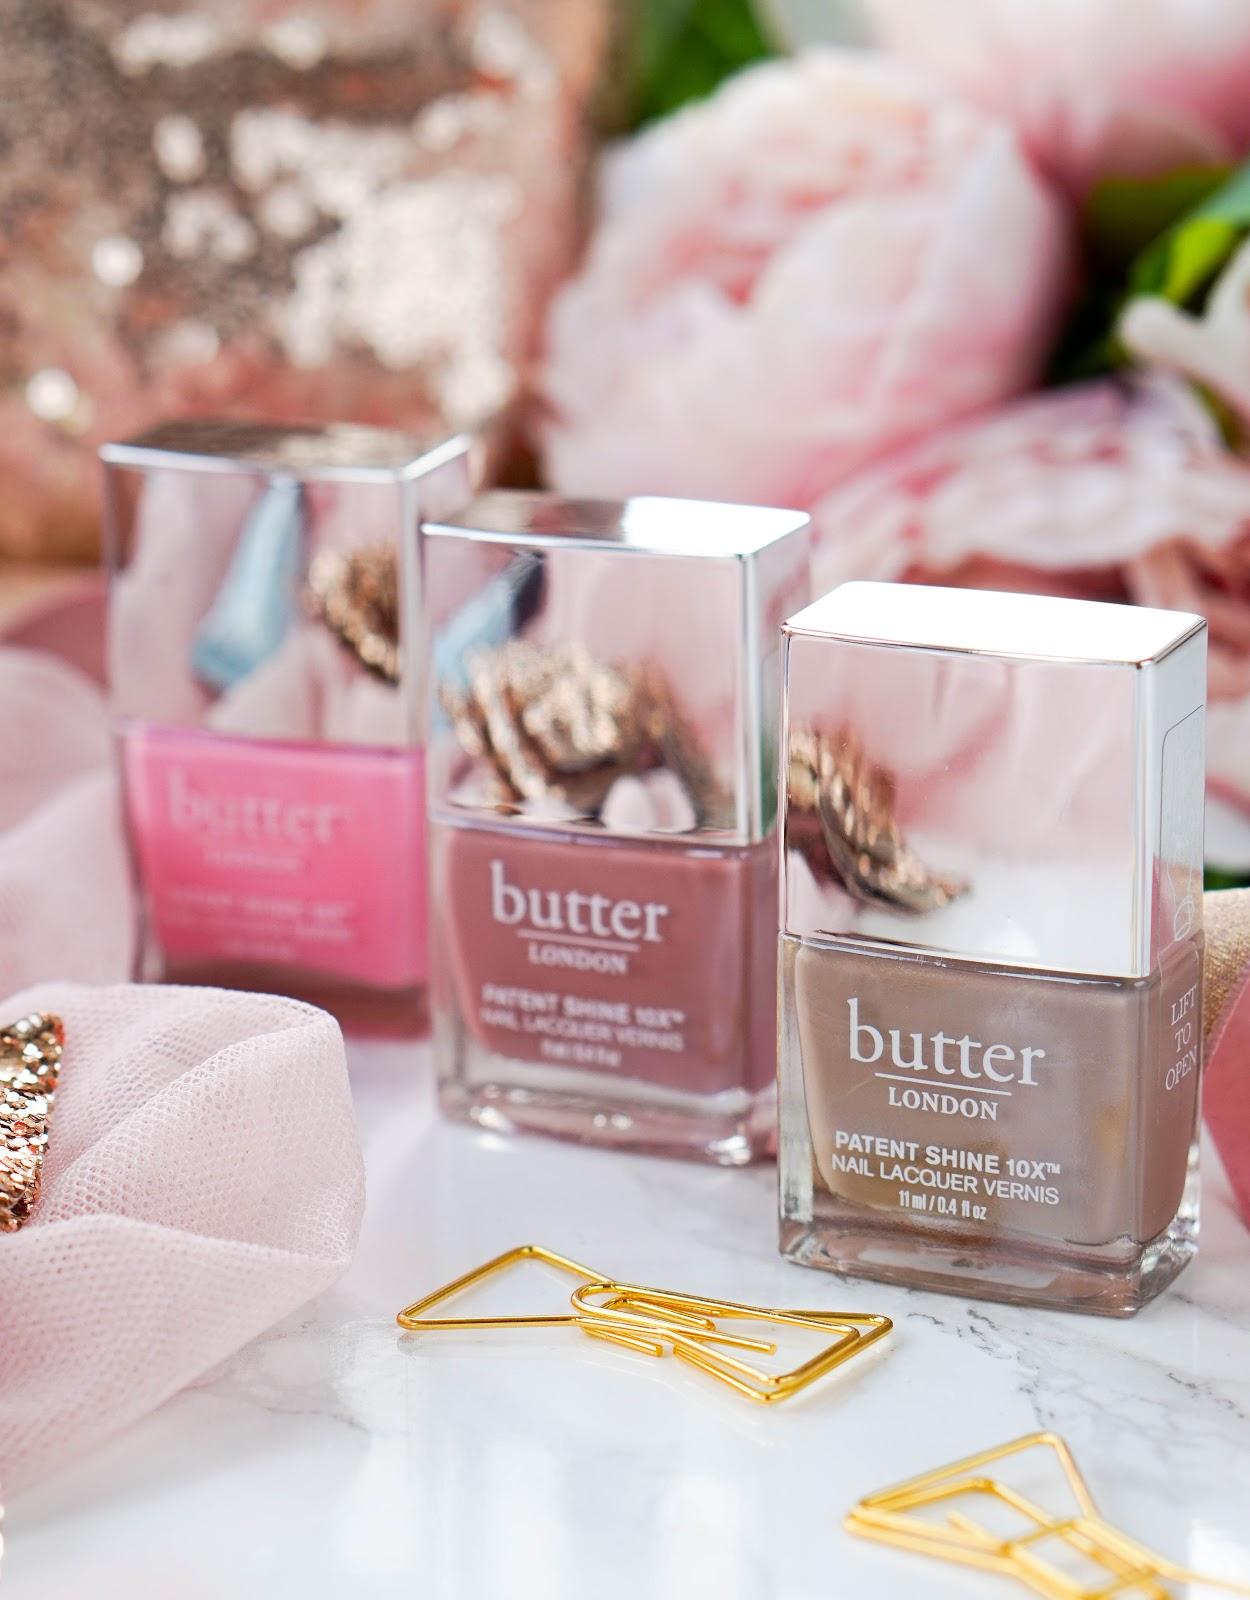 Introducing Butter London